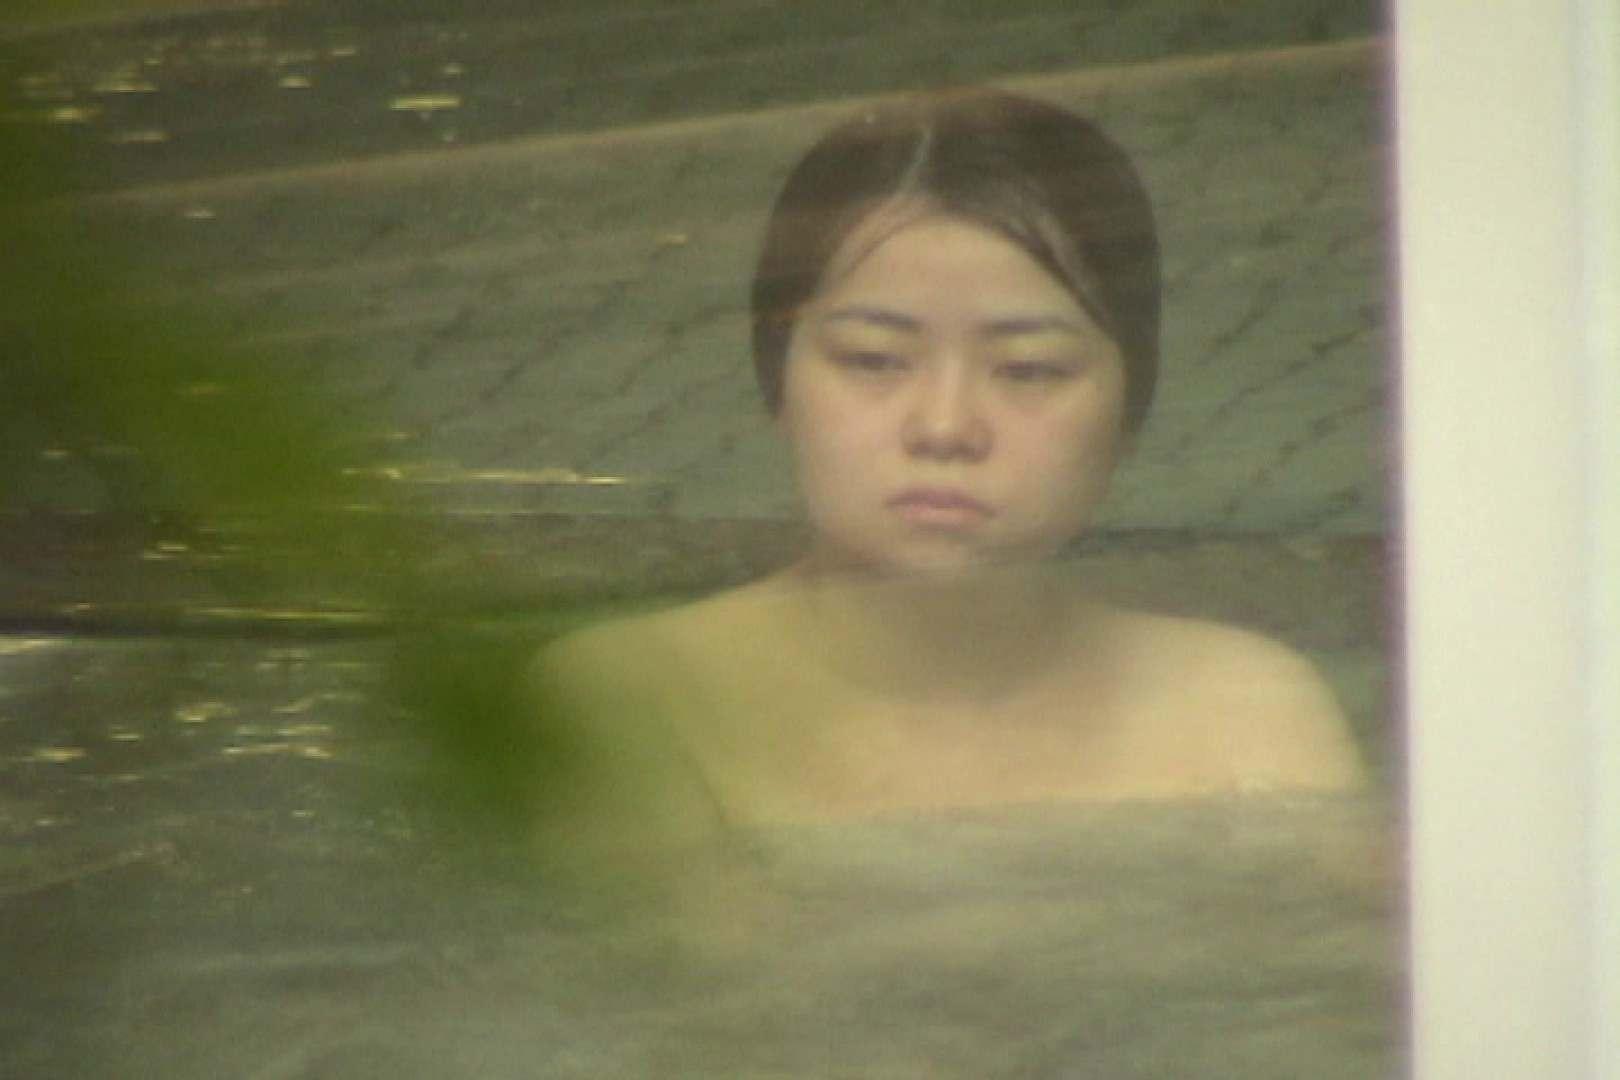 Aquaな露天風呂Vol.456 盗撮 | HなOL  102pic 67